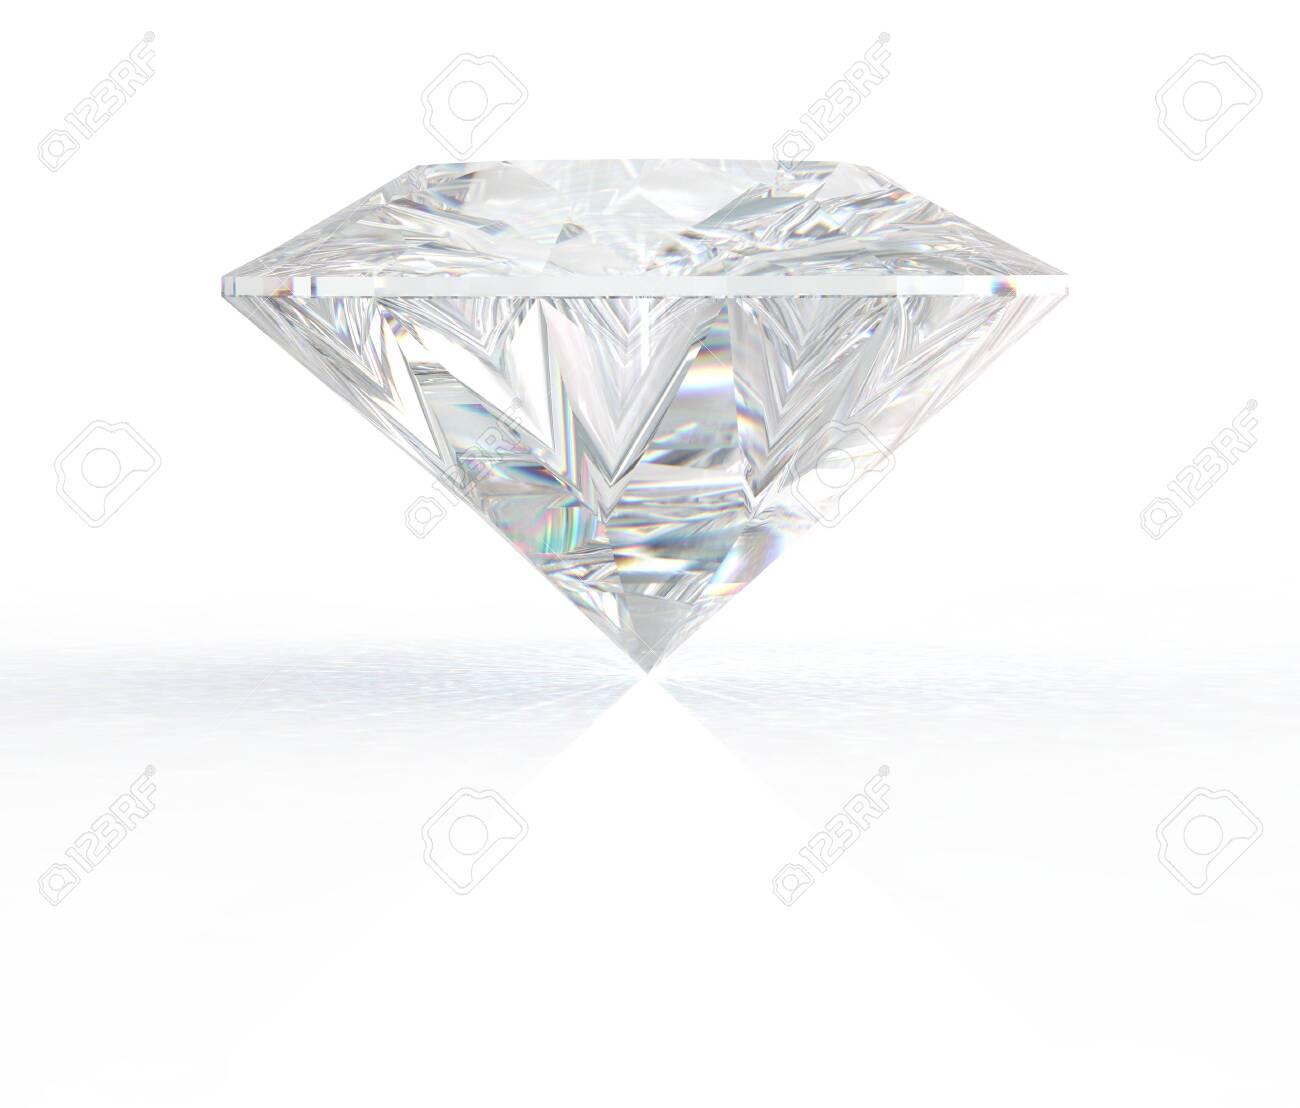 3d render gemstone. Diamond jewel on background. - 149551175